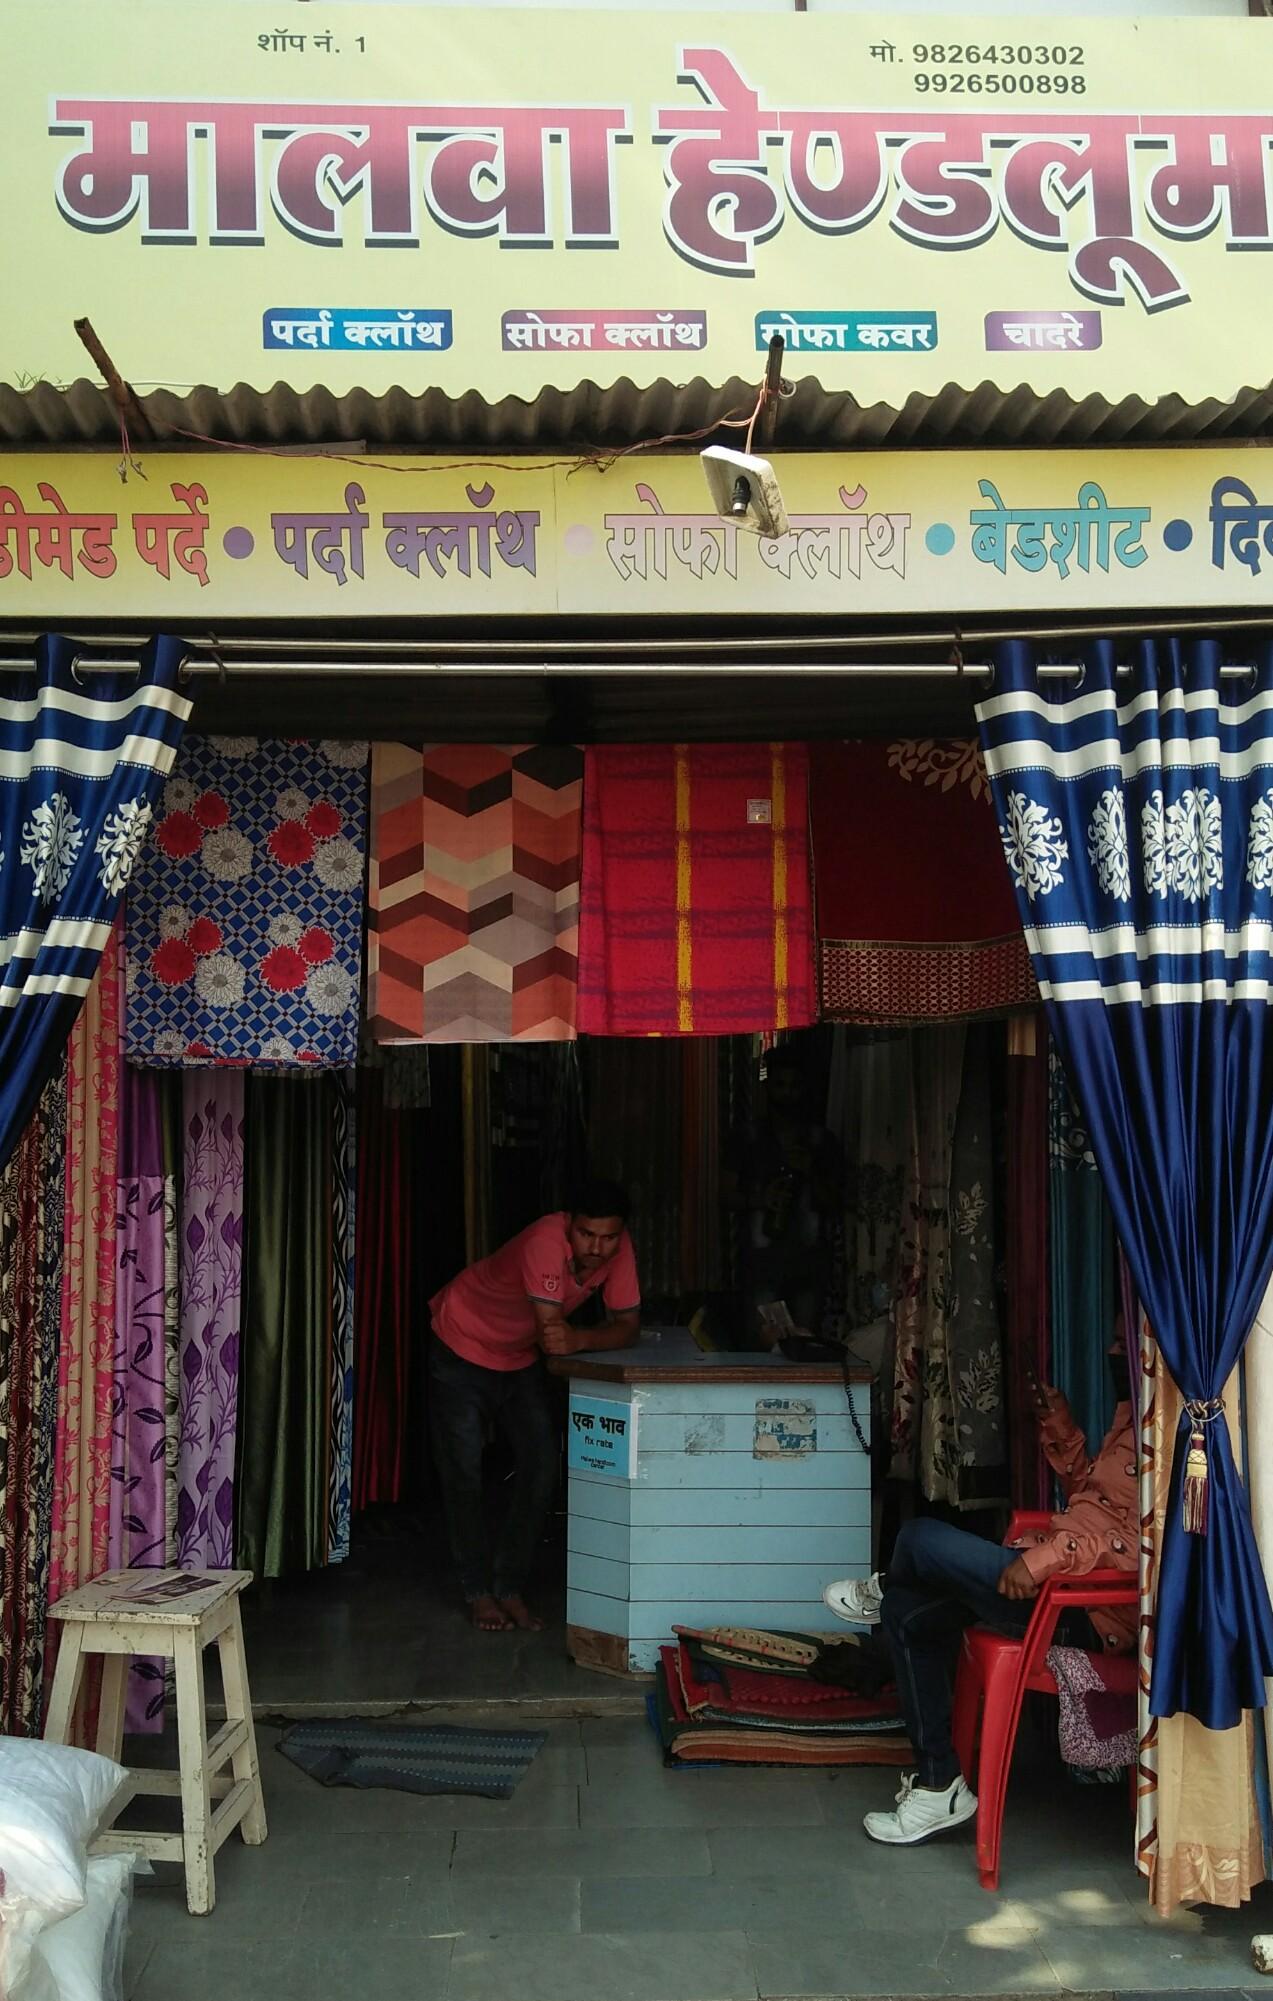 Malwa handloom center